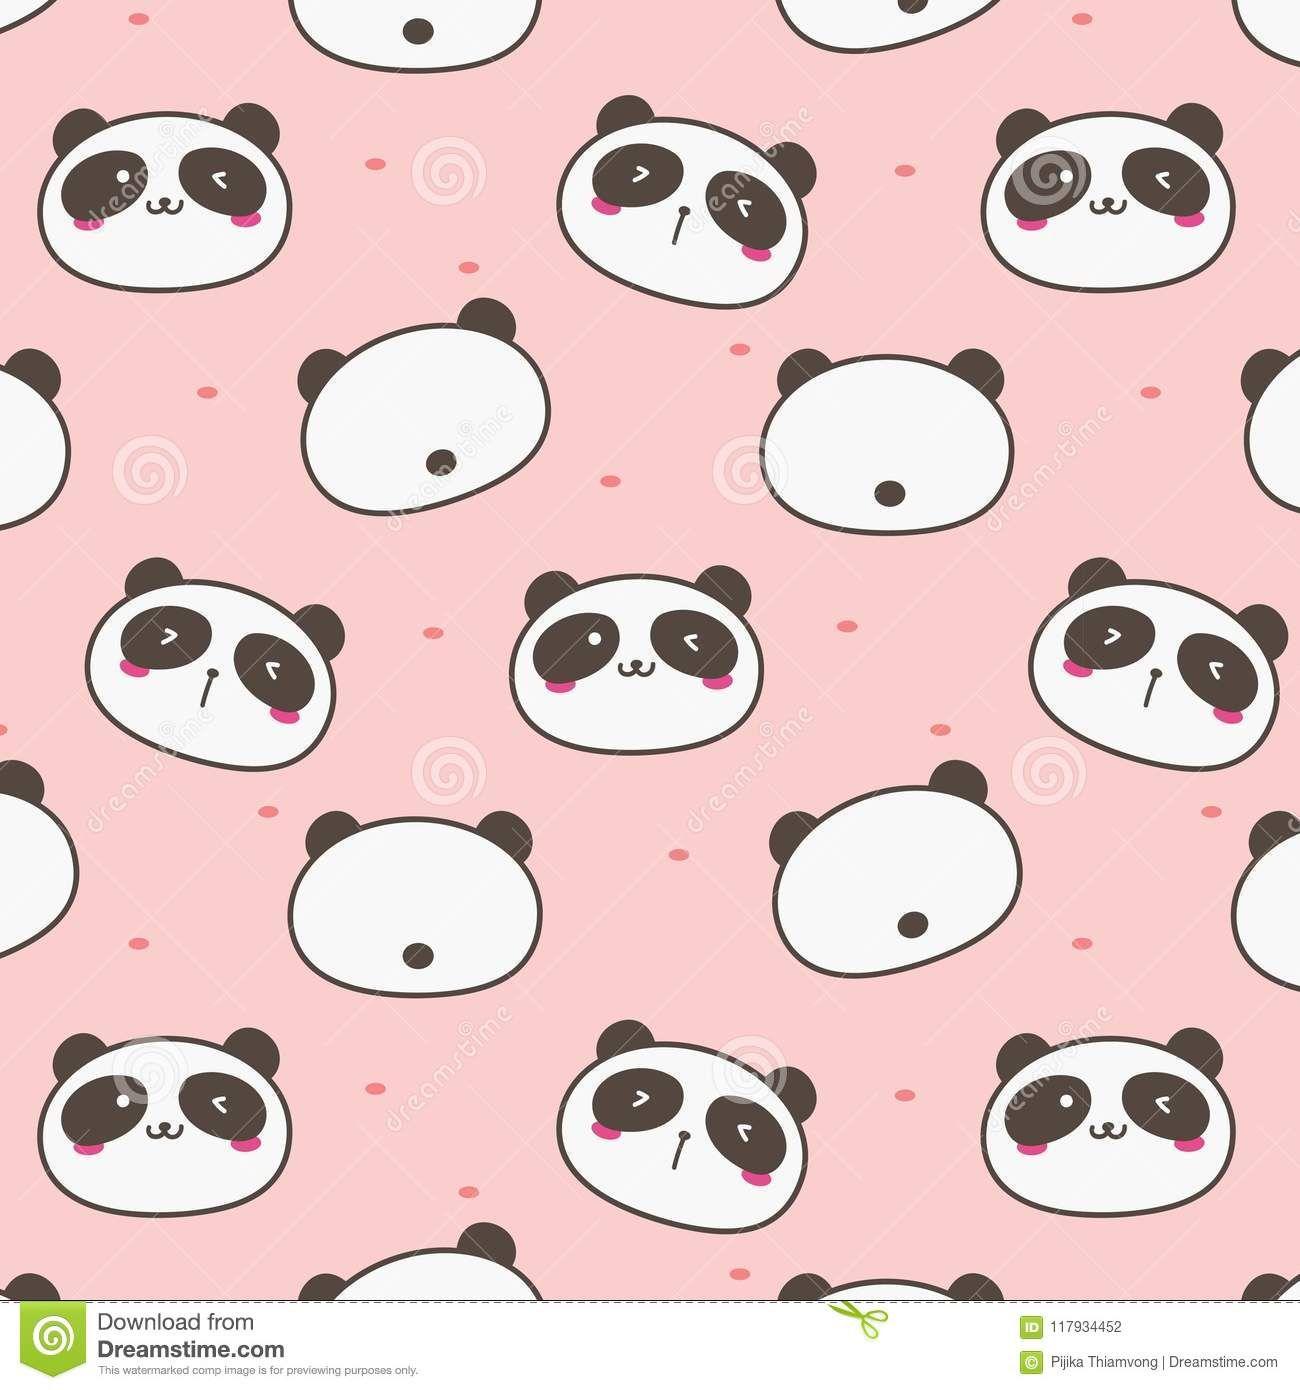 Cute Panda Vector Pattern Background Cute Panda Wallpaper Panda Background Background Patterns